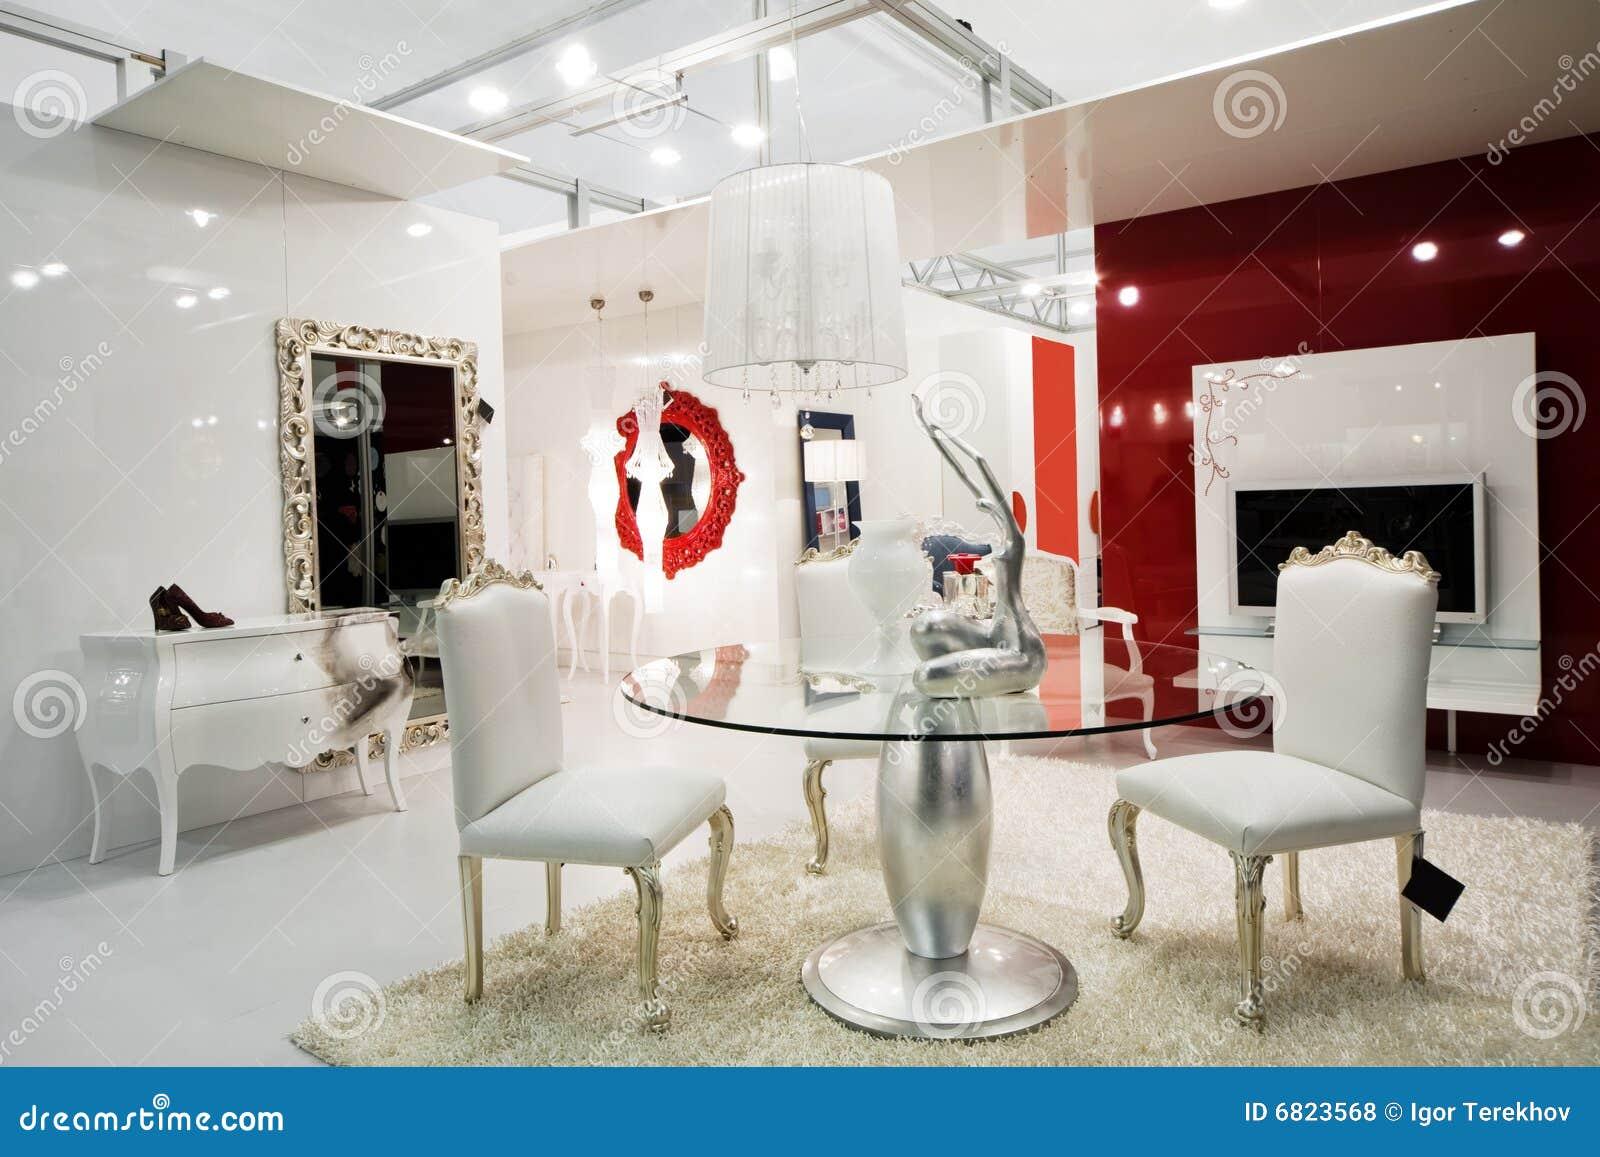 Furniture Store Royalty Free Stock Photos Image 6823568